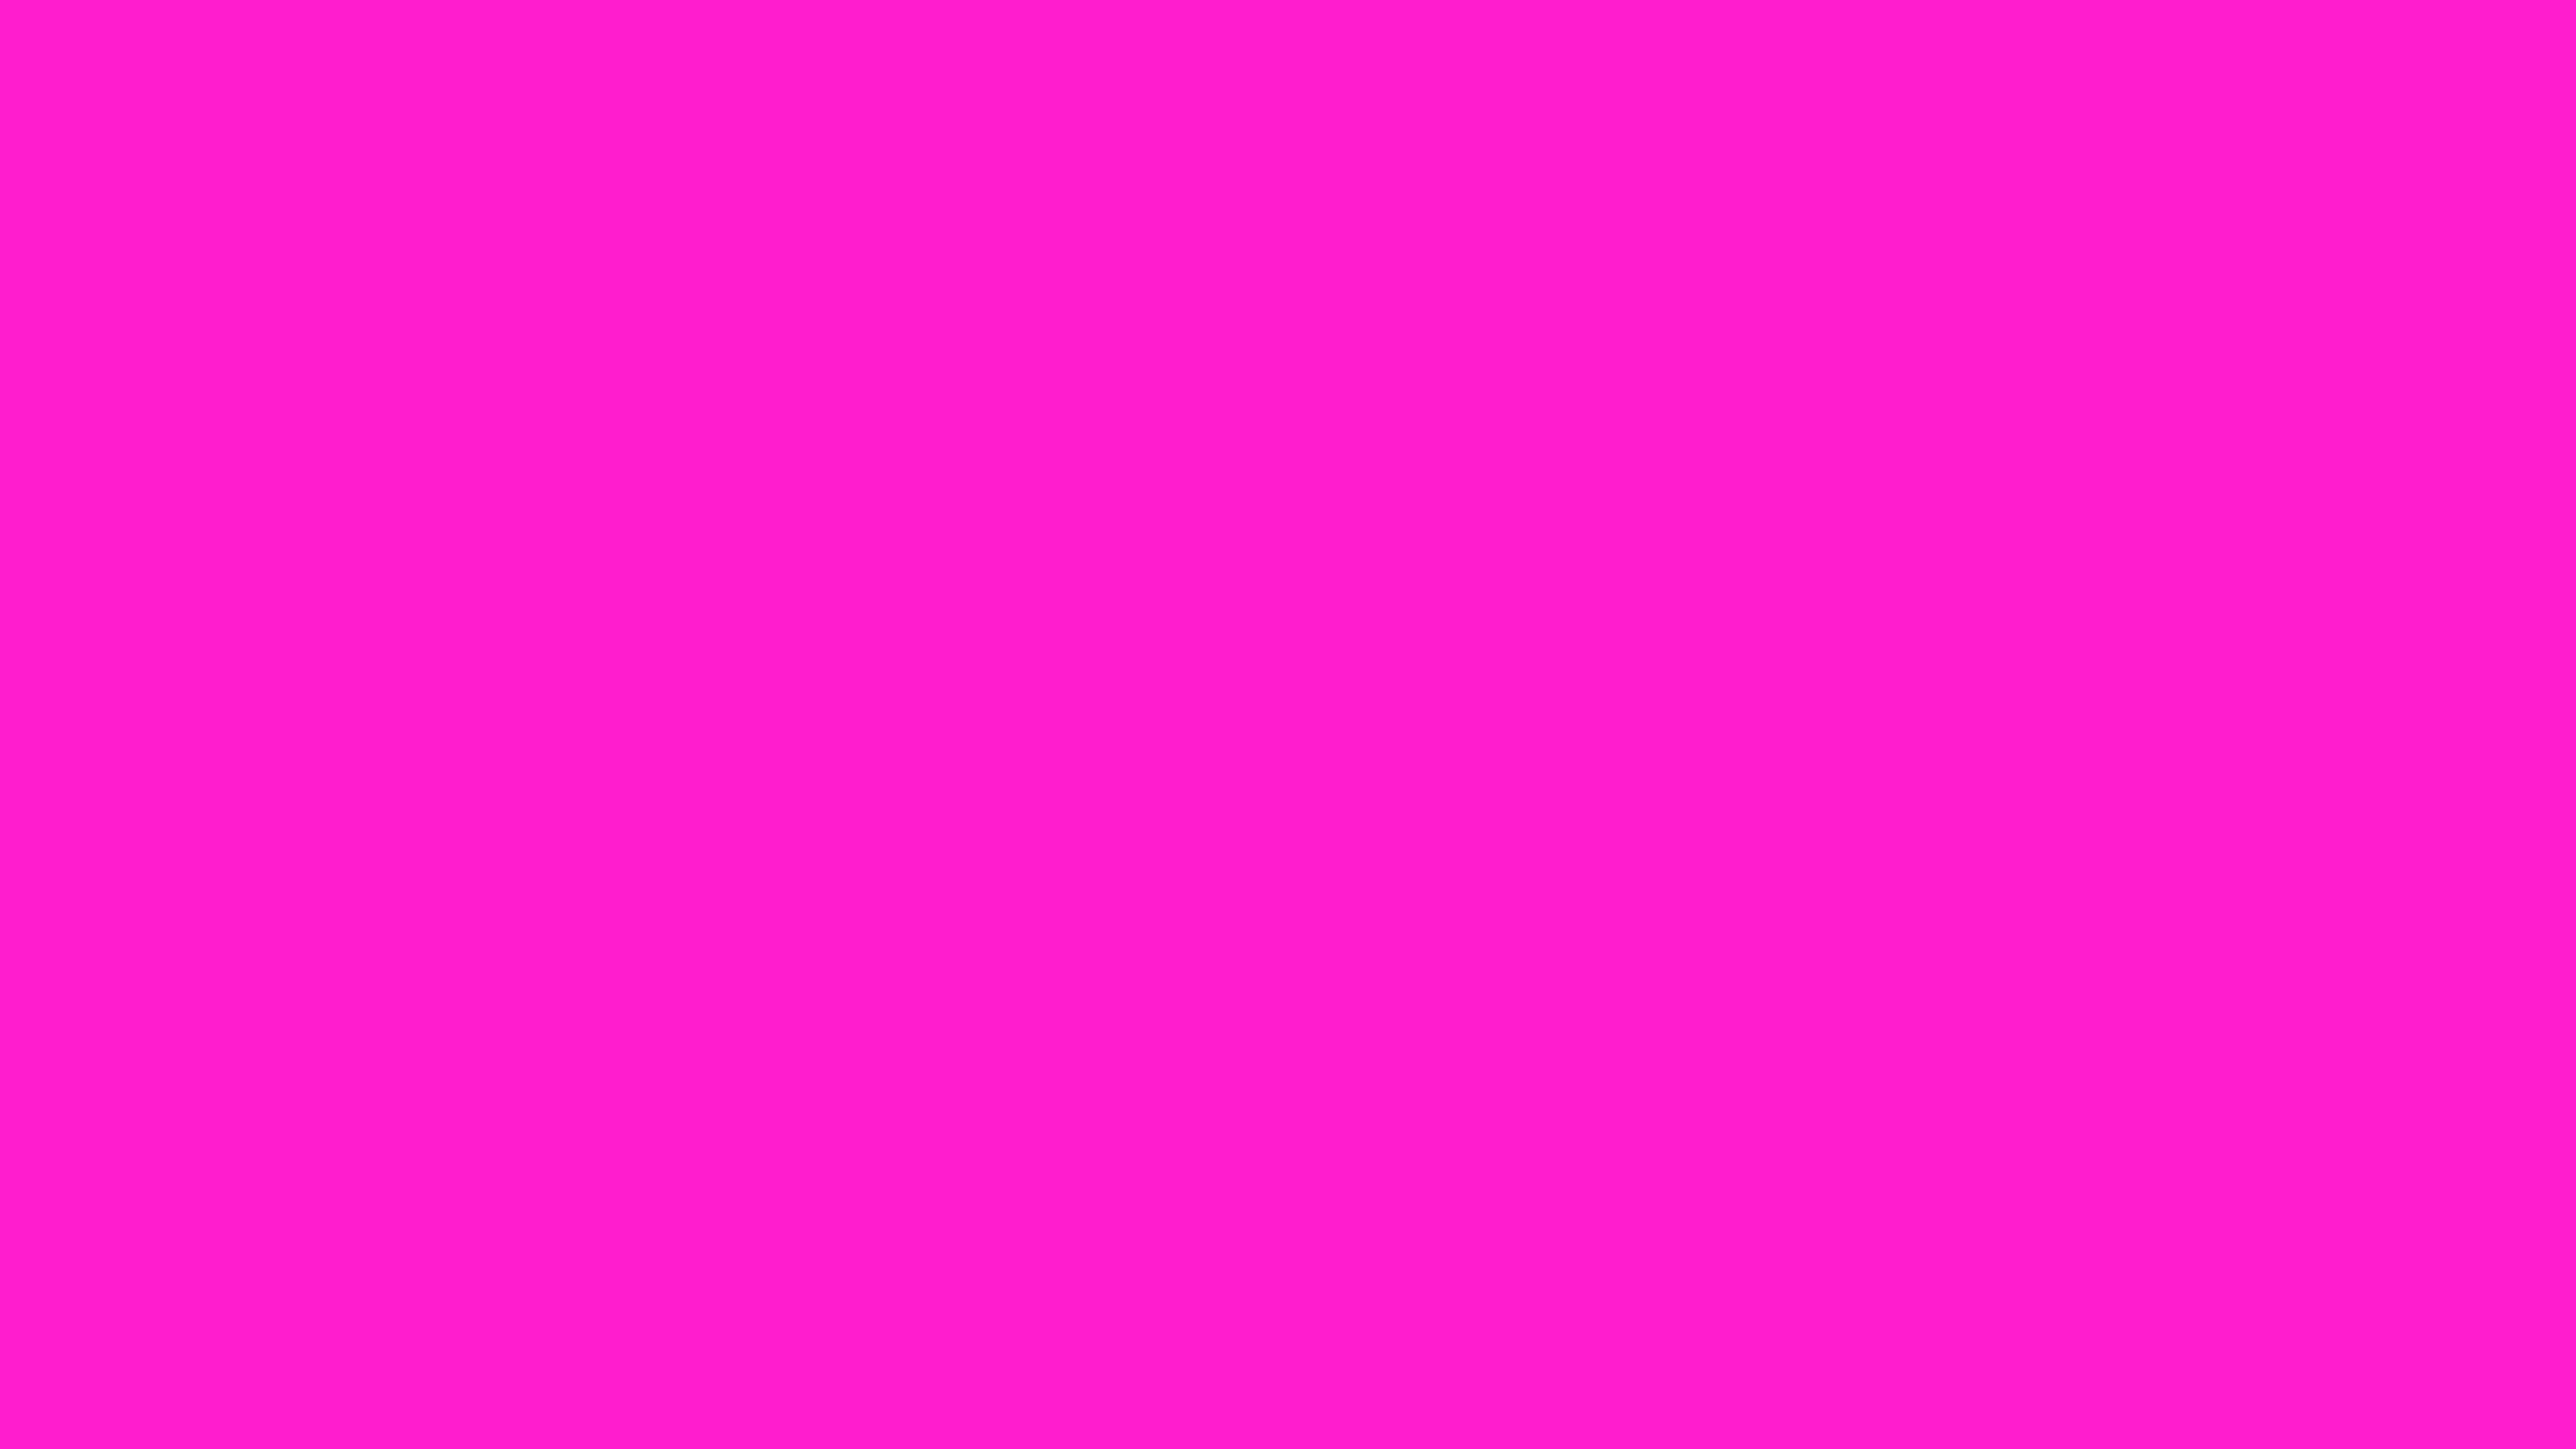 7680x4320 Hot Magenta Solid Color Background